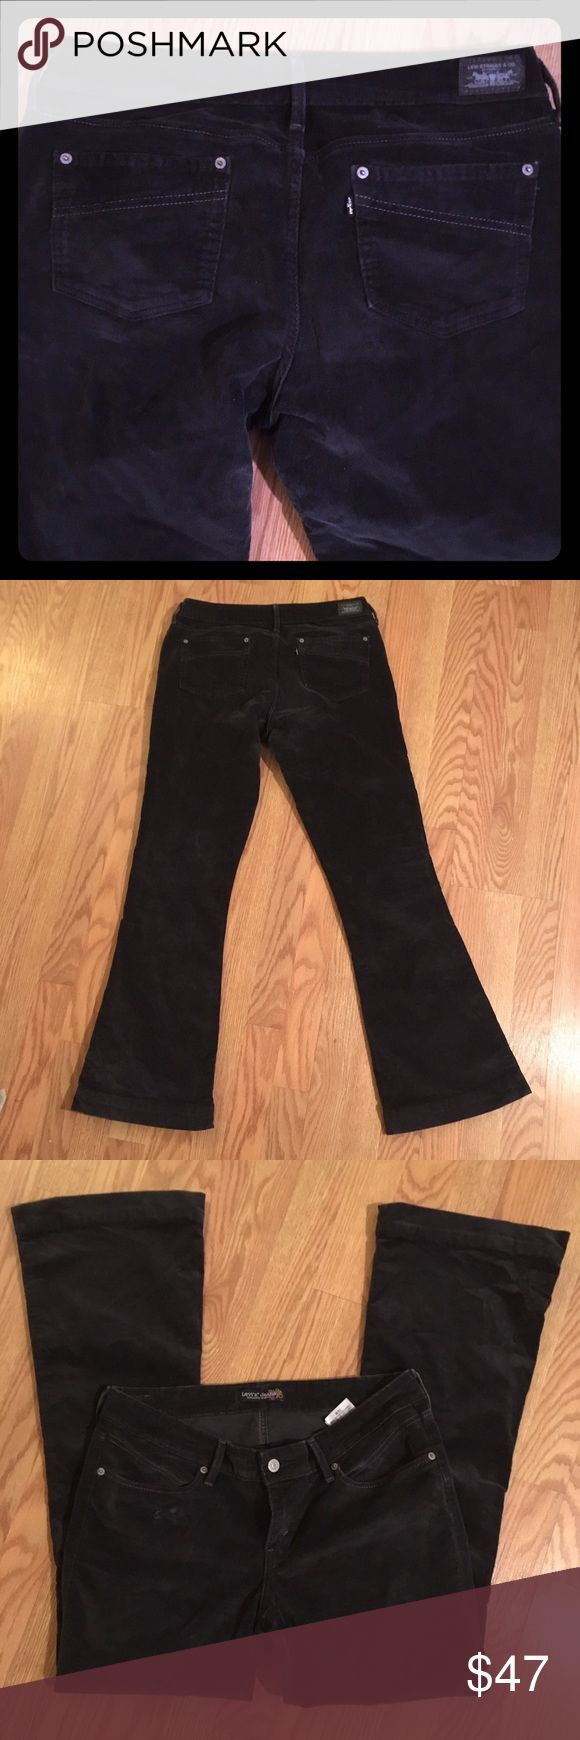 Levi's Dark Gray Stretch Boot cut Corduroy Jean Levi's Dark Gray Stretch Boot cut Corduroy Jeans Pants, 13 M, worn once, EUC Levi's Jeans Boot Cut